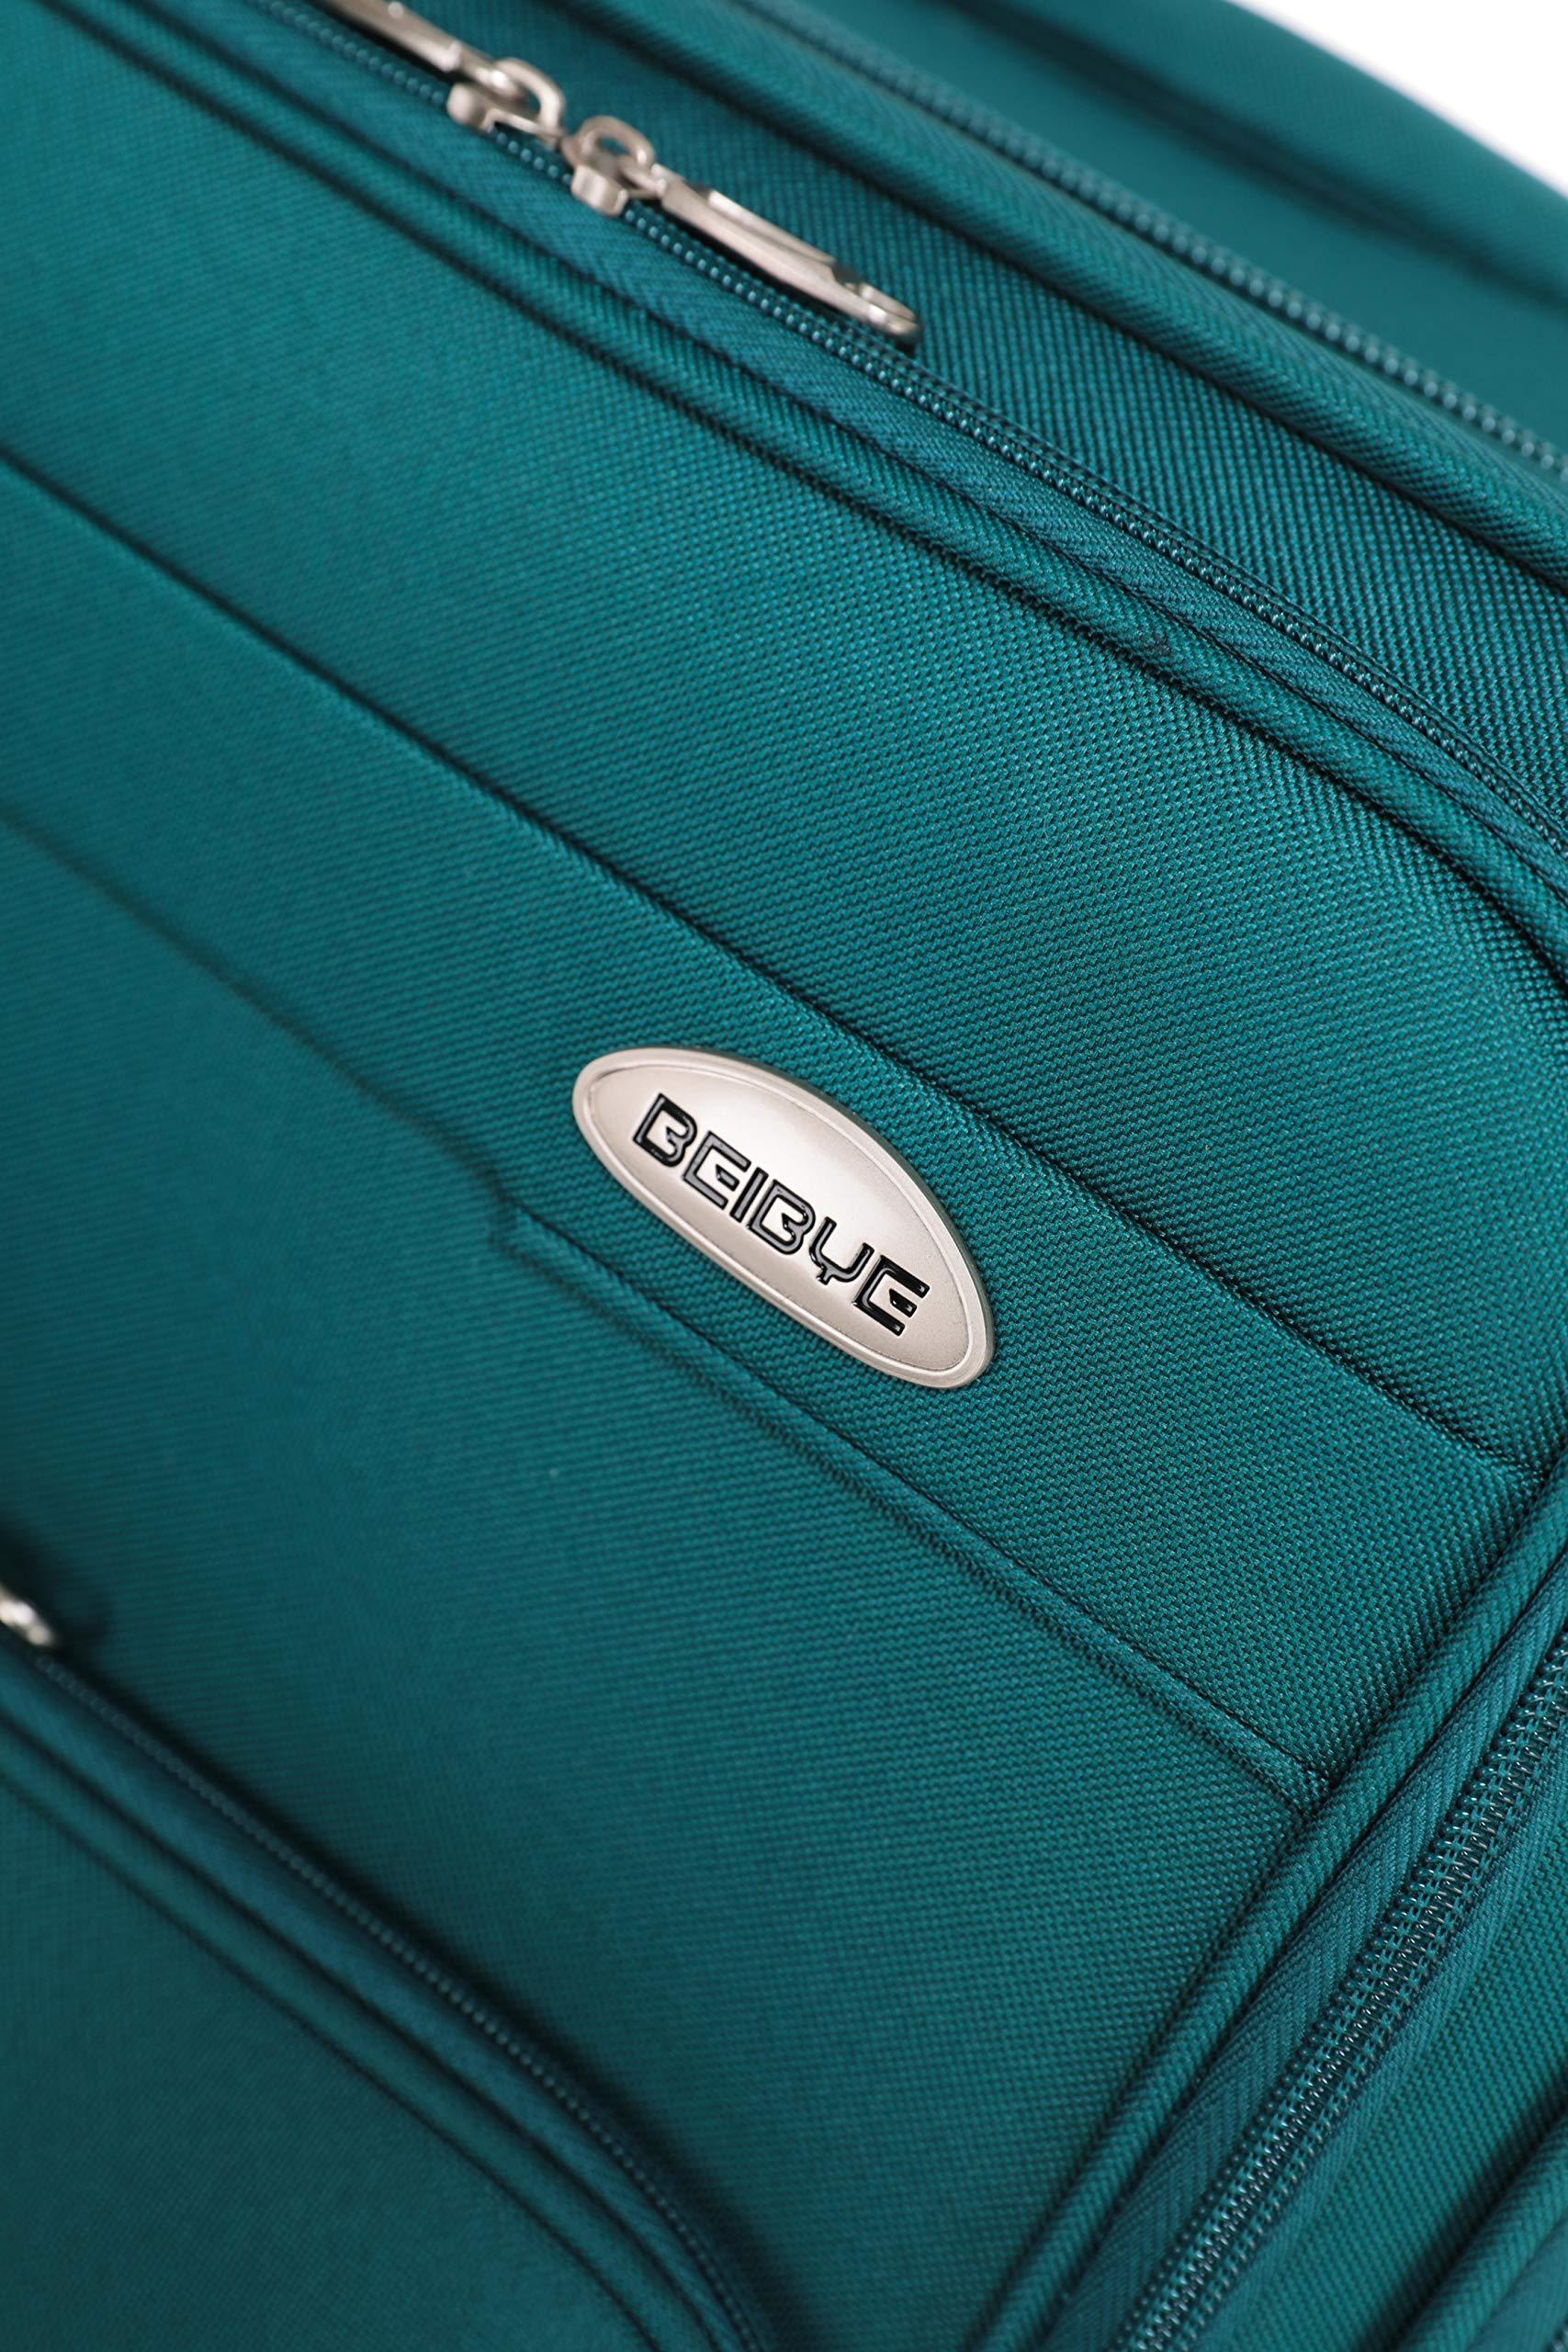 BEIBYE-4-Rollen-Reisekoffer-3tlgStoffkoffer-Handgepck-Kindergepck-Gepck-Koffer-Trolley-Set-XL-L-M